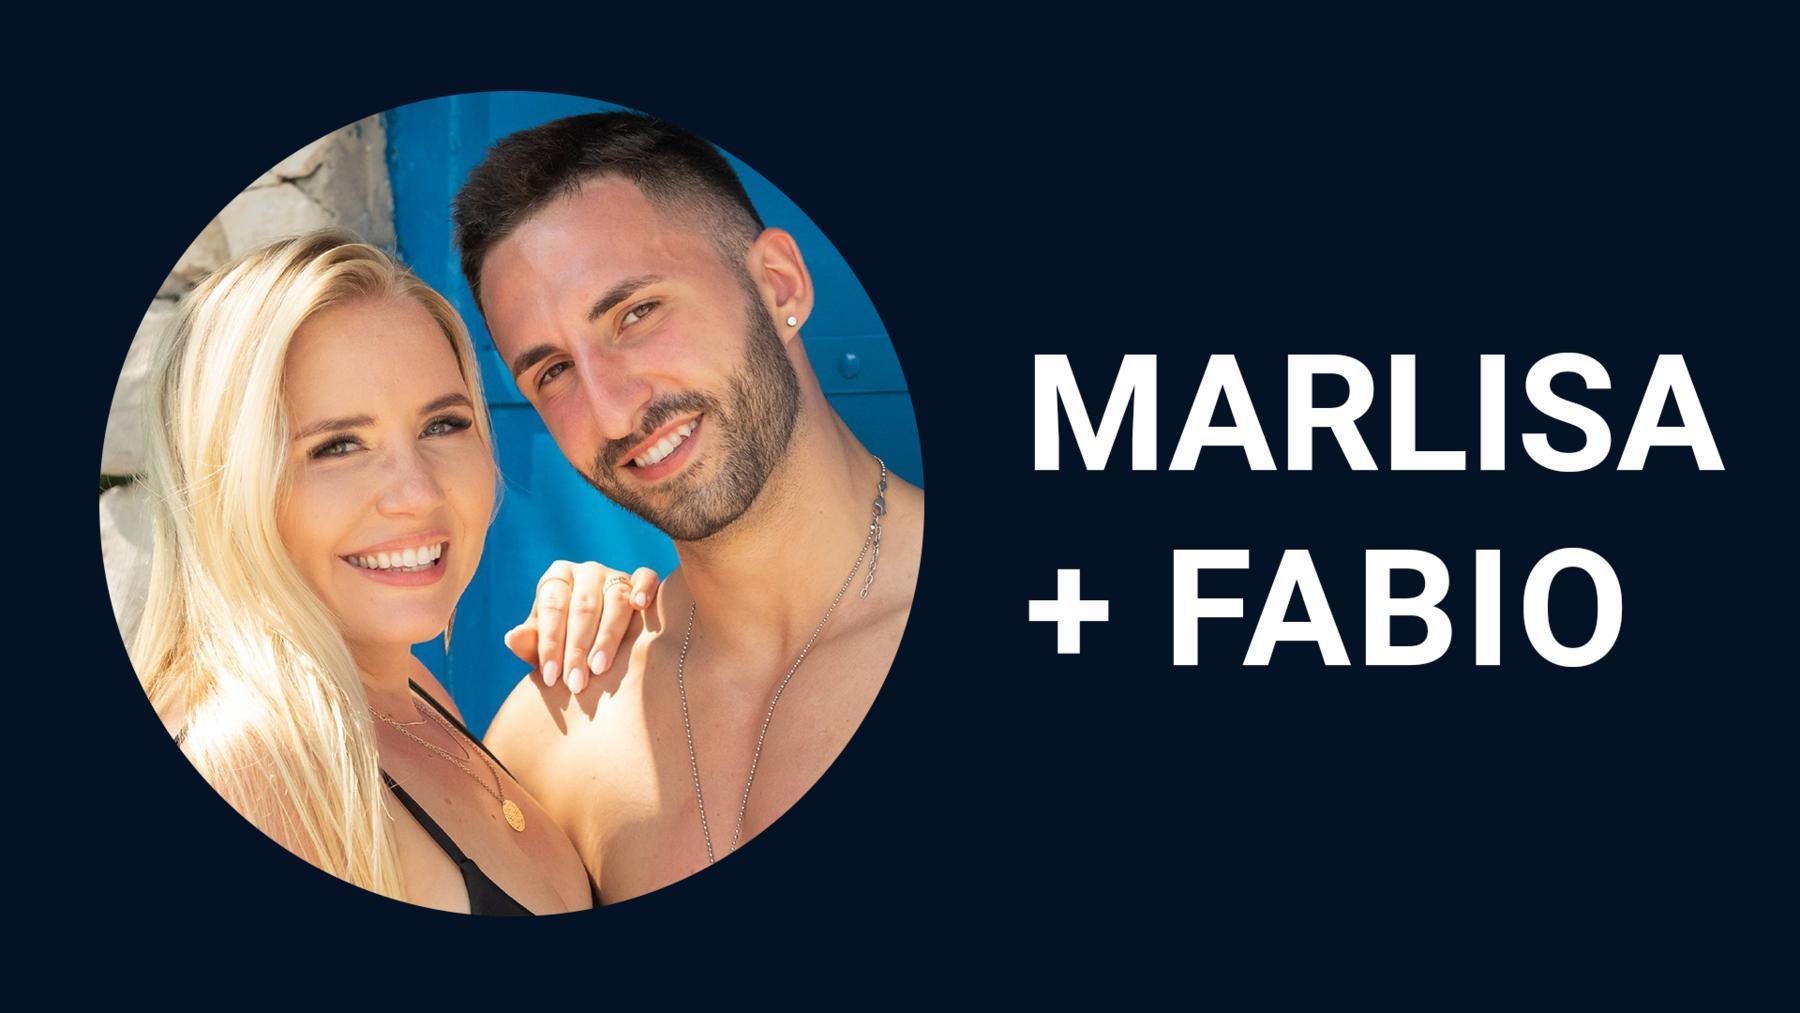 Marlisa + Fabio